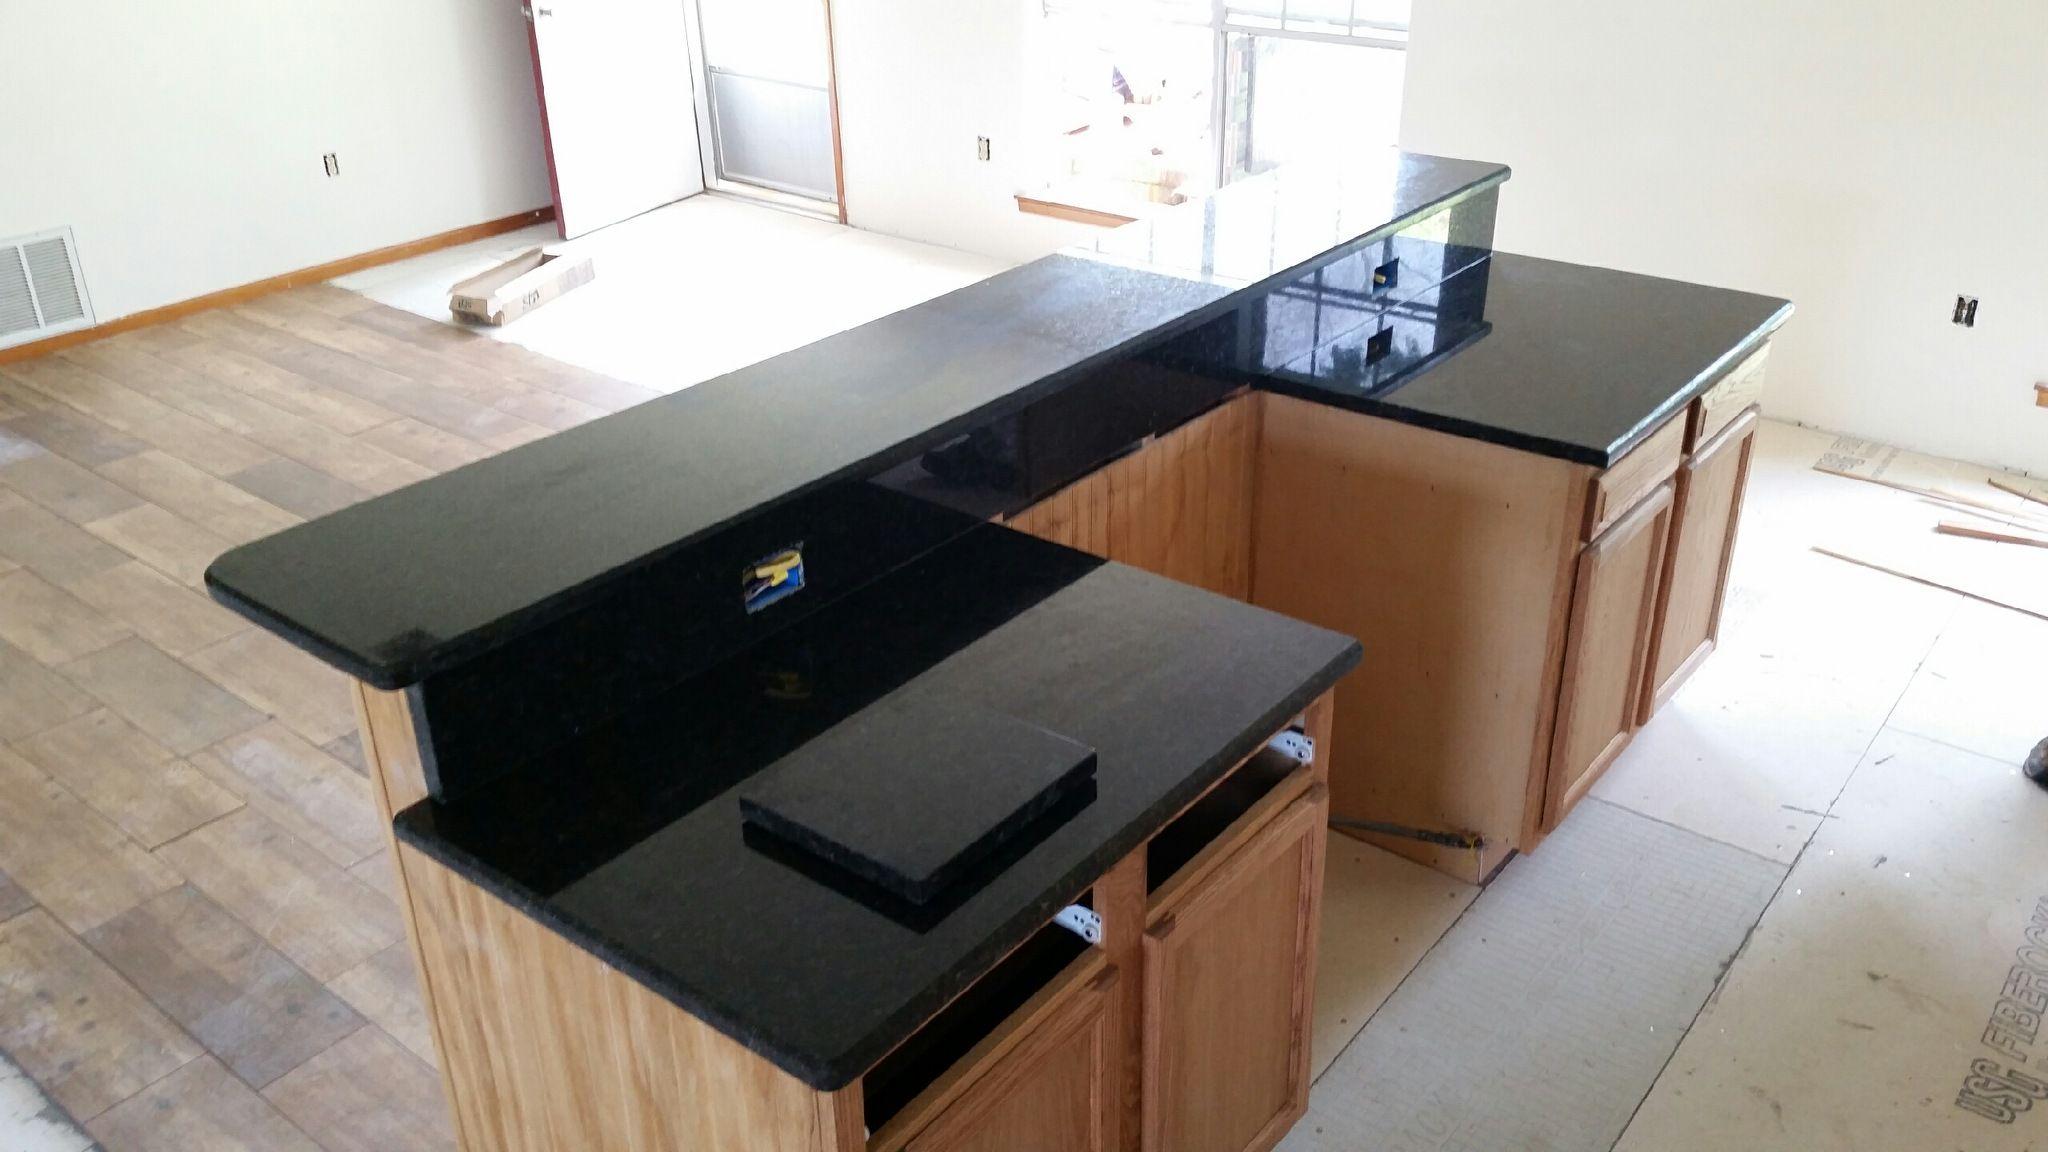 pin by jasonrasp0187 on black countertops black countertops countertops home decor on kitchen decor black countertop id=89983